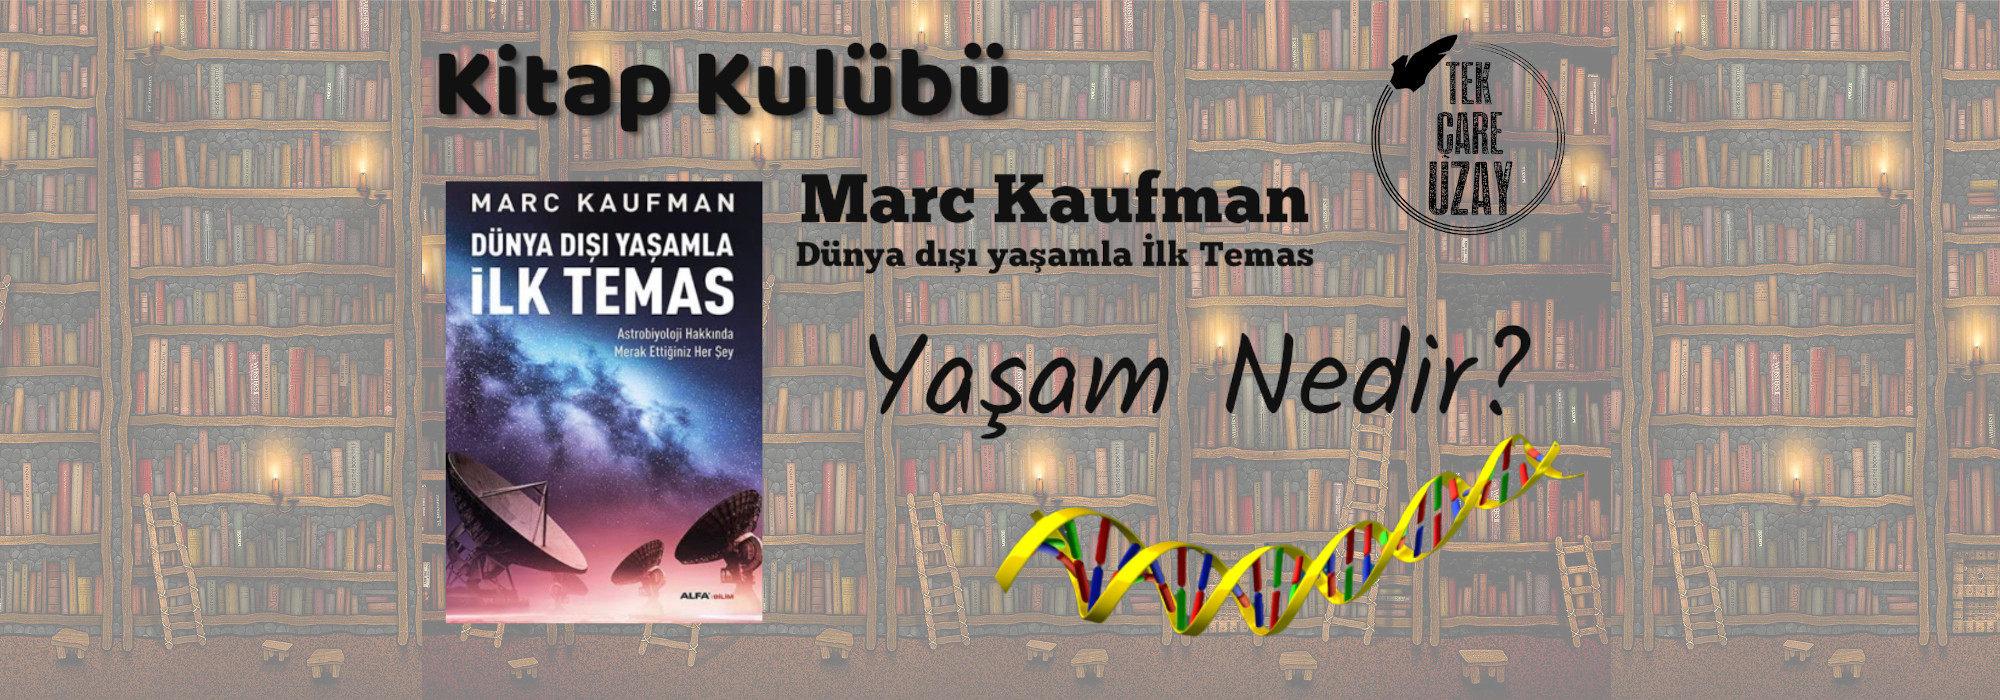 Tek Çare Uzay | Kitap Kulübü – Marc Kaufman: Dünya Dışı Yaşamla İlk Temas (Yaşam Nedir?)